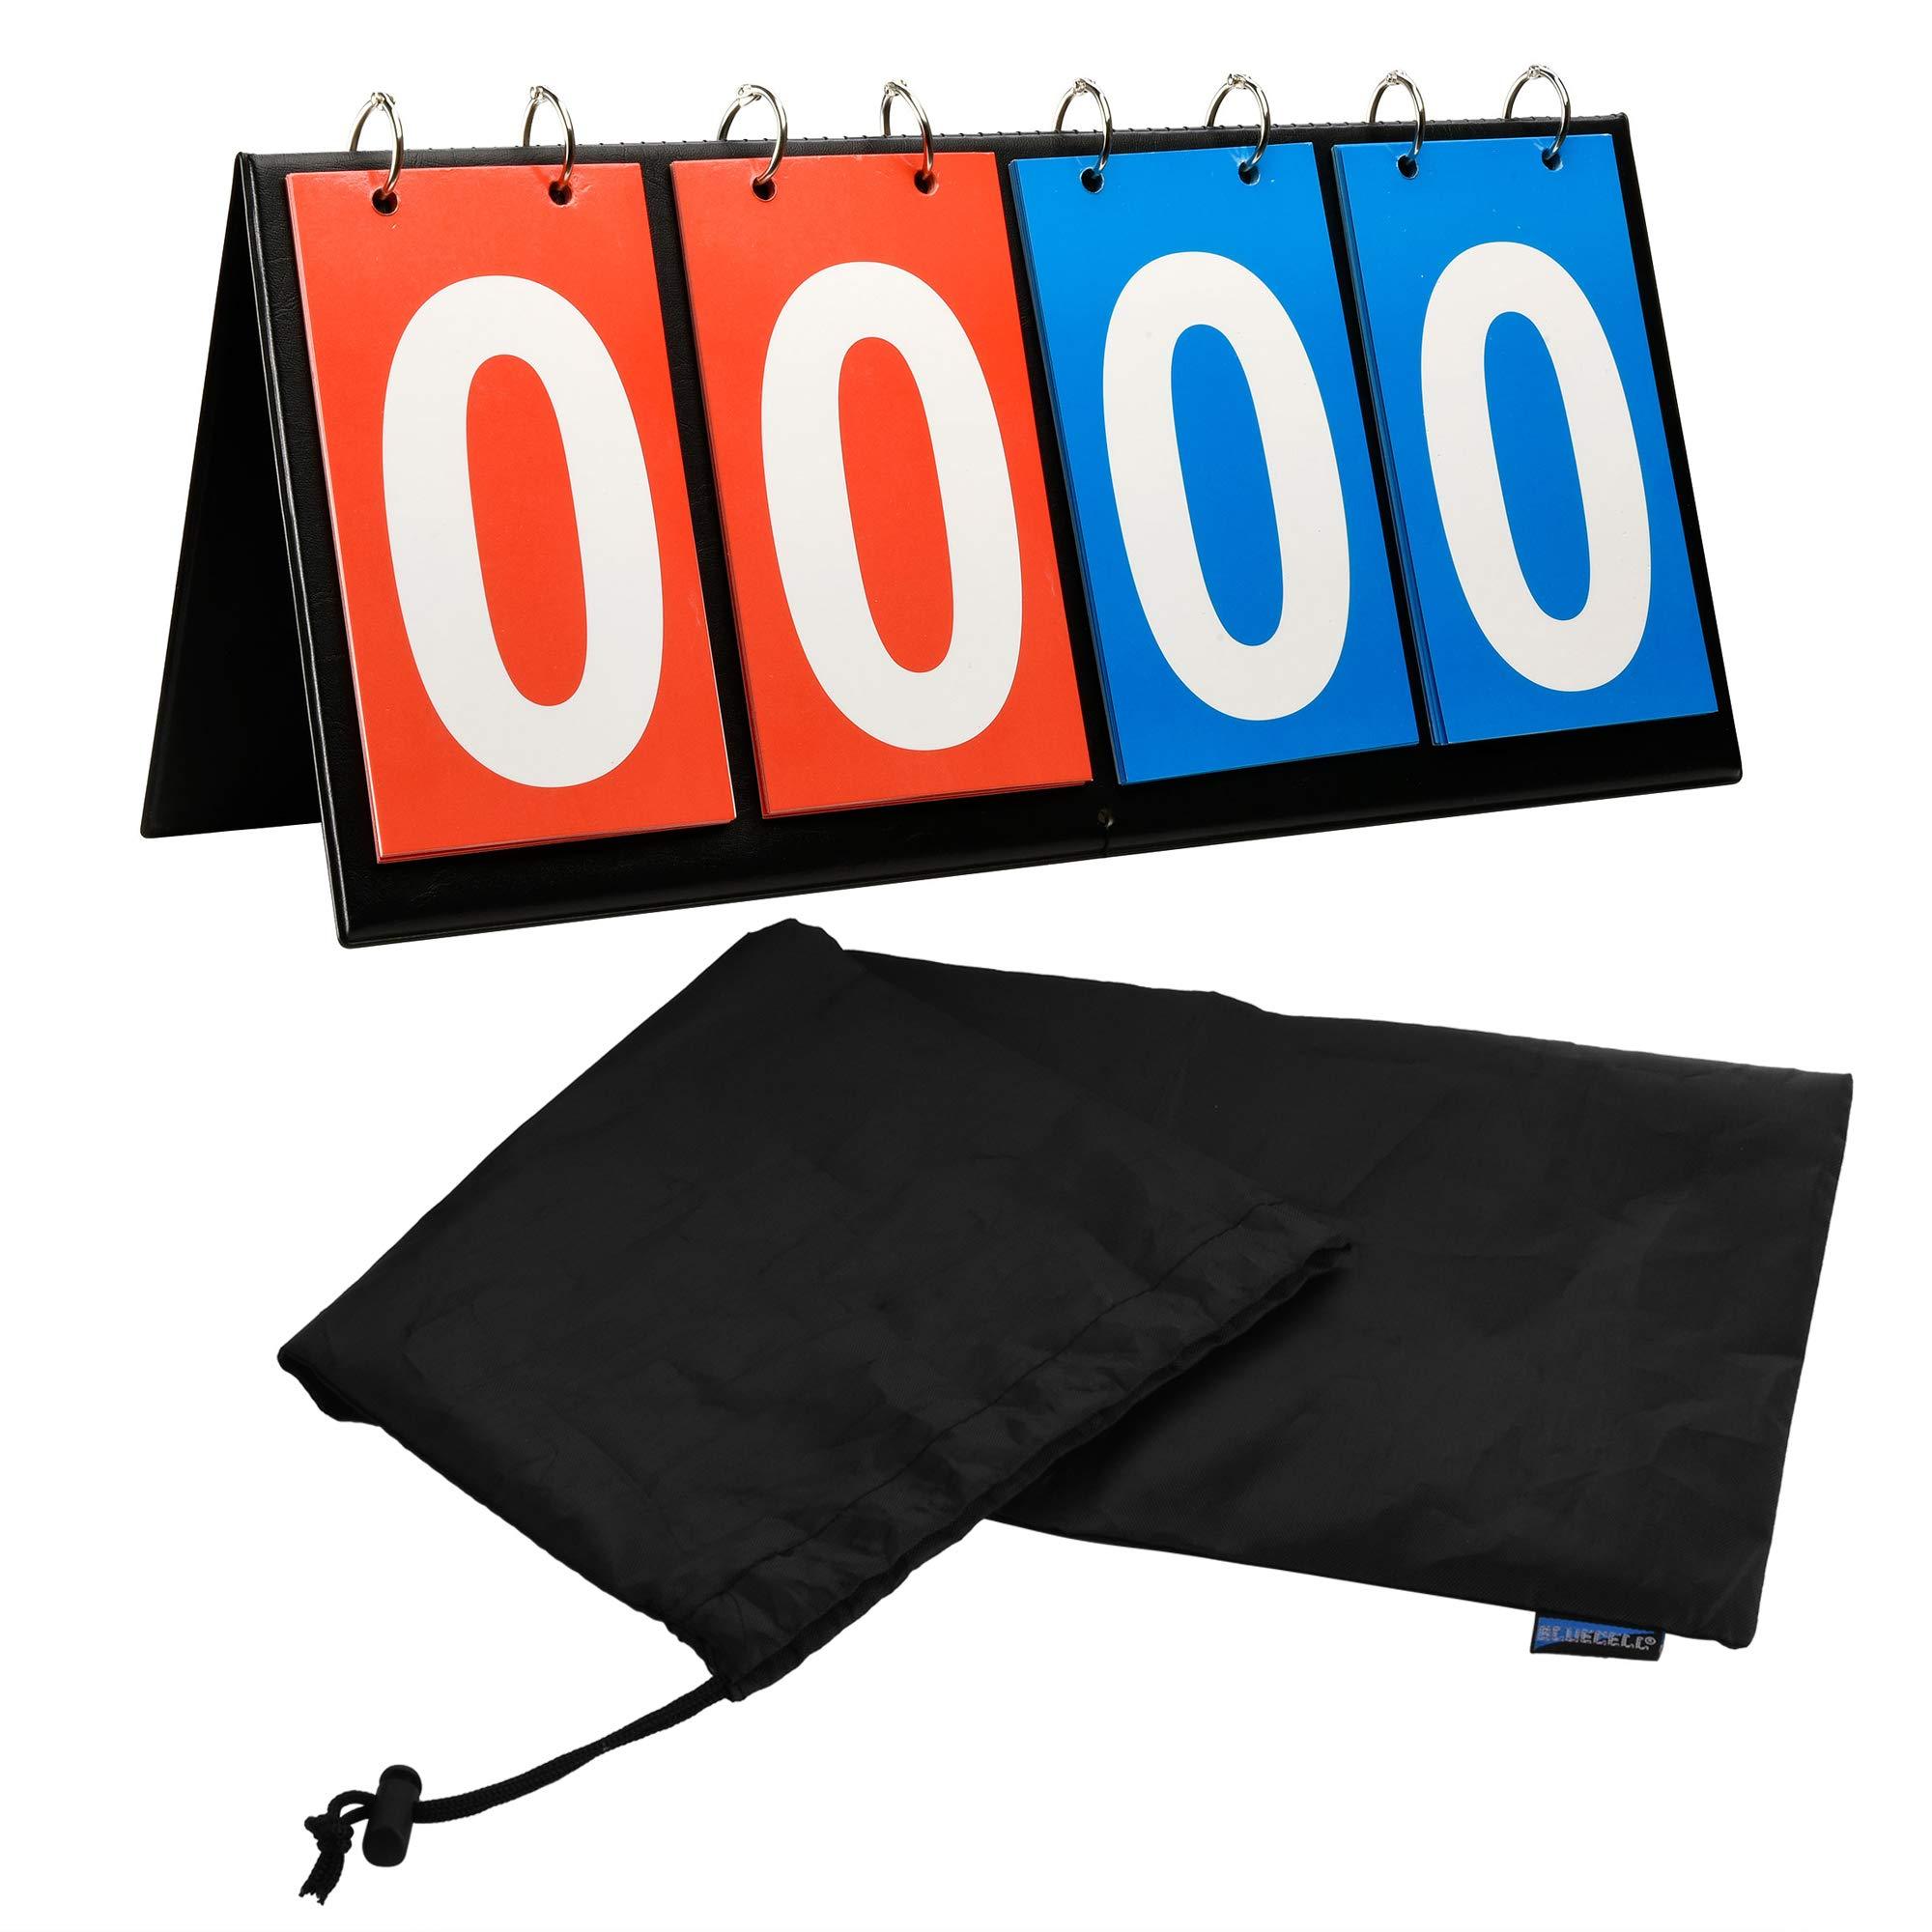 4-Digital Tabletop Sports Flipper Scoreboard For Volleyball Football Basketball